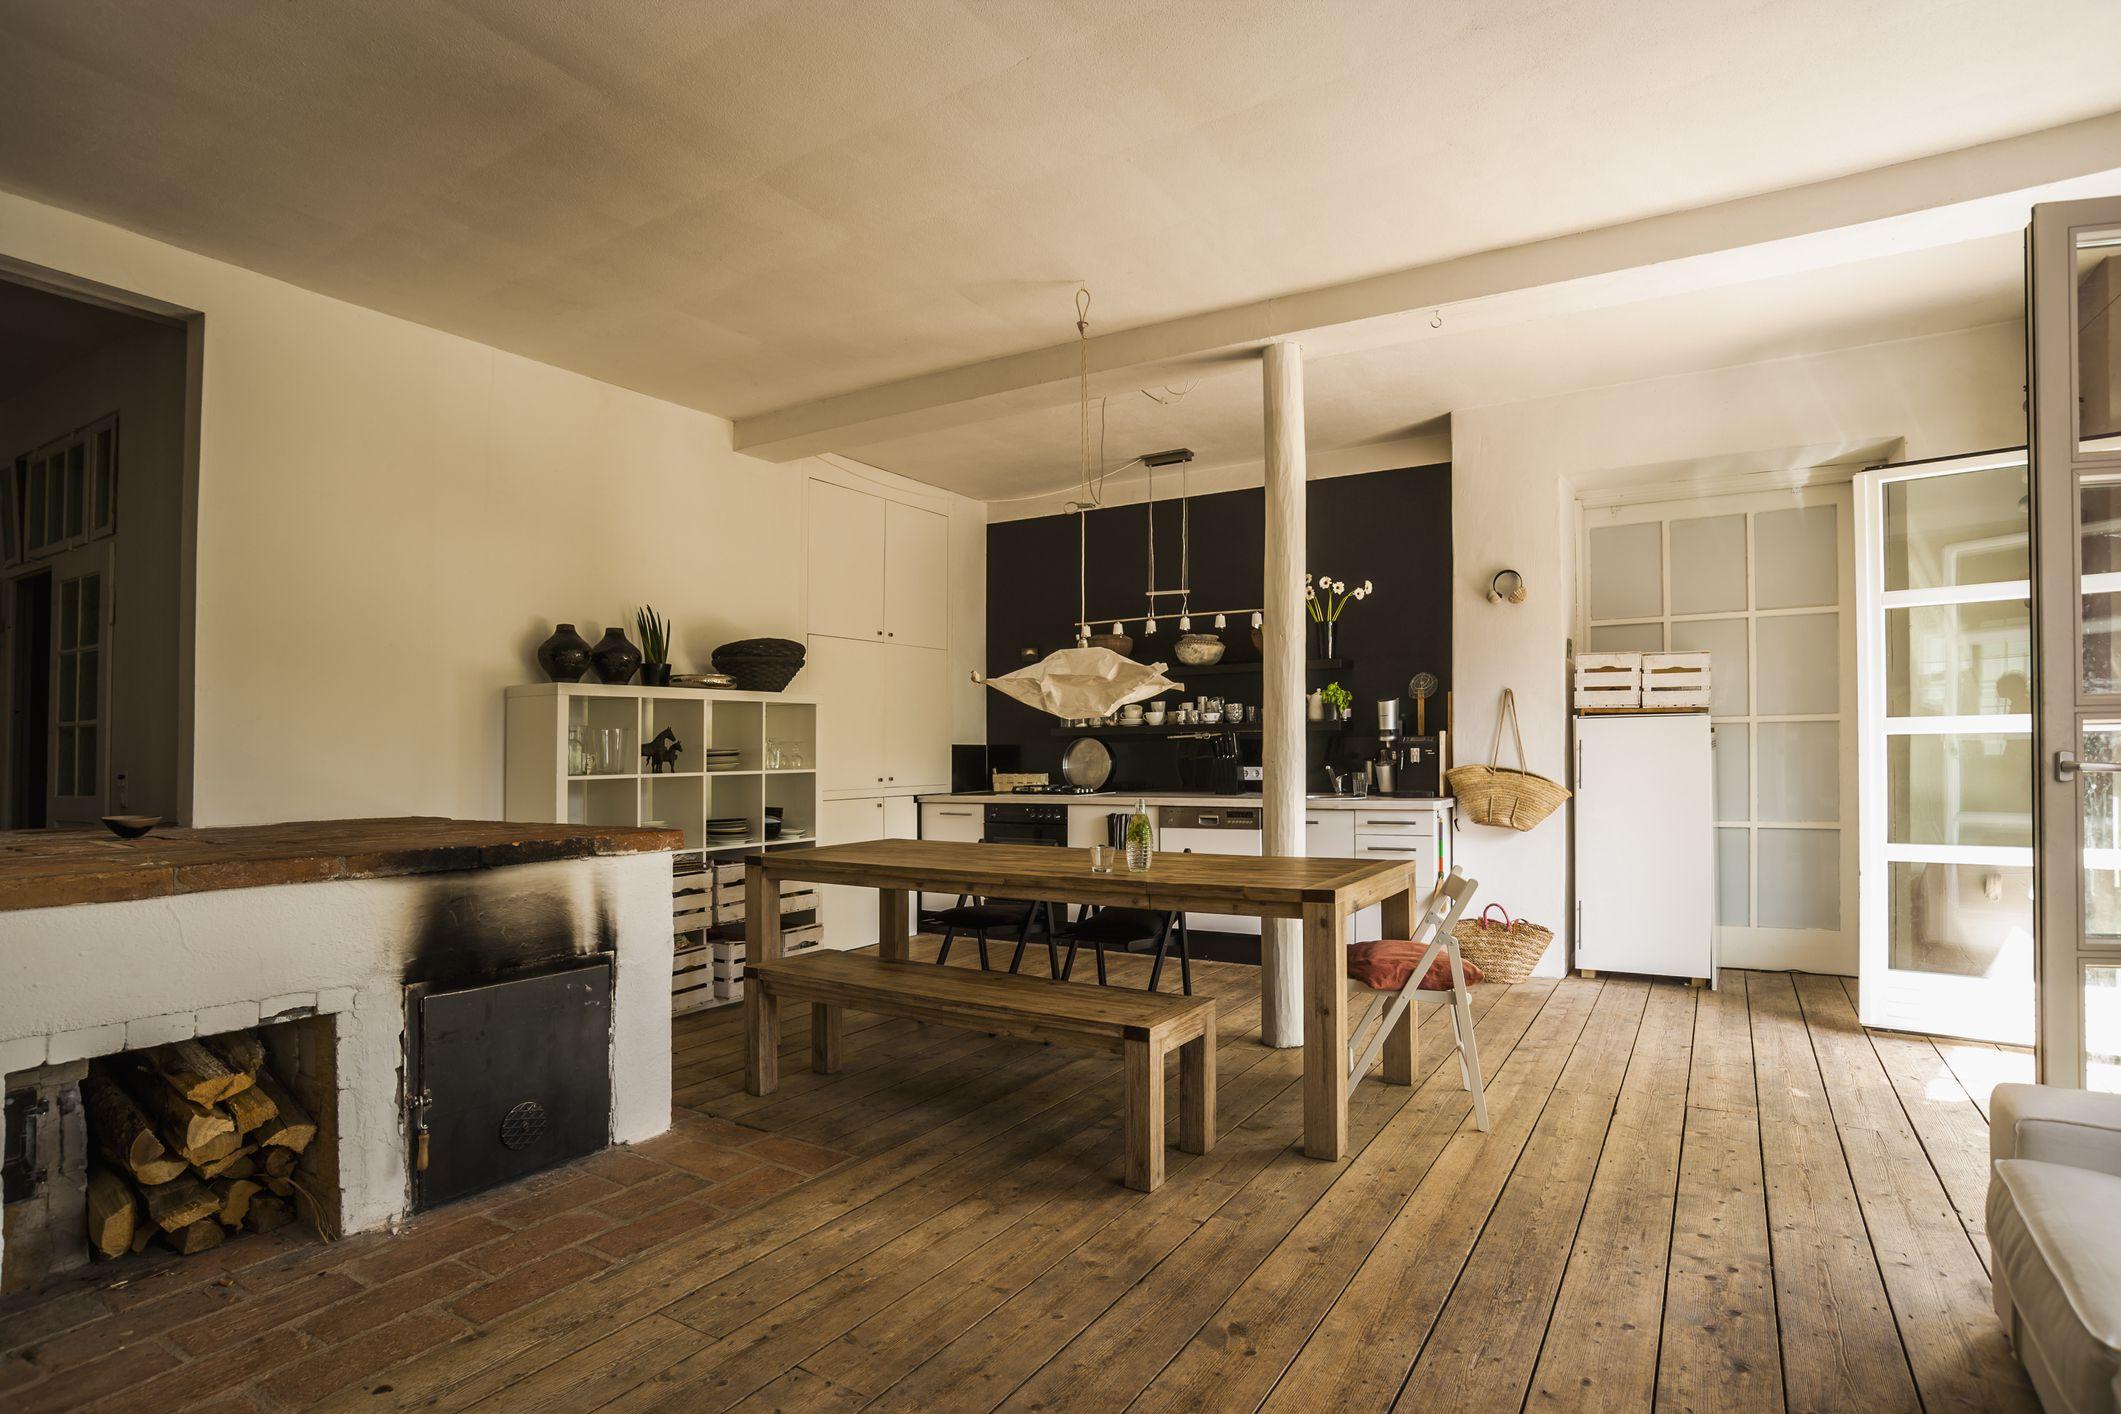 hardwood flooring deals ontario of vinyl wood flooring versus natural hardwood with diningroom woodenfloor gettyimages 544546775 590e57565f9b58647043440a